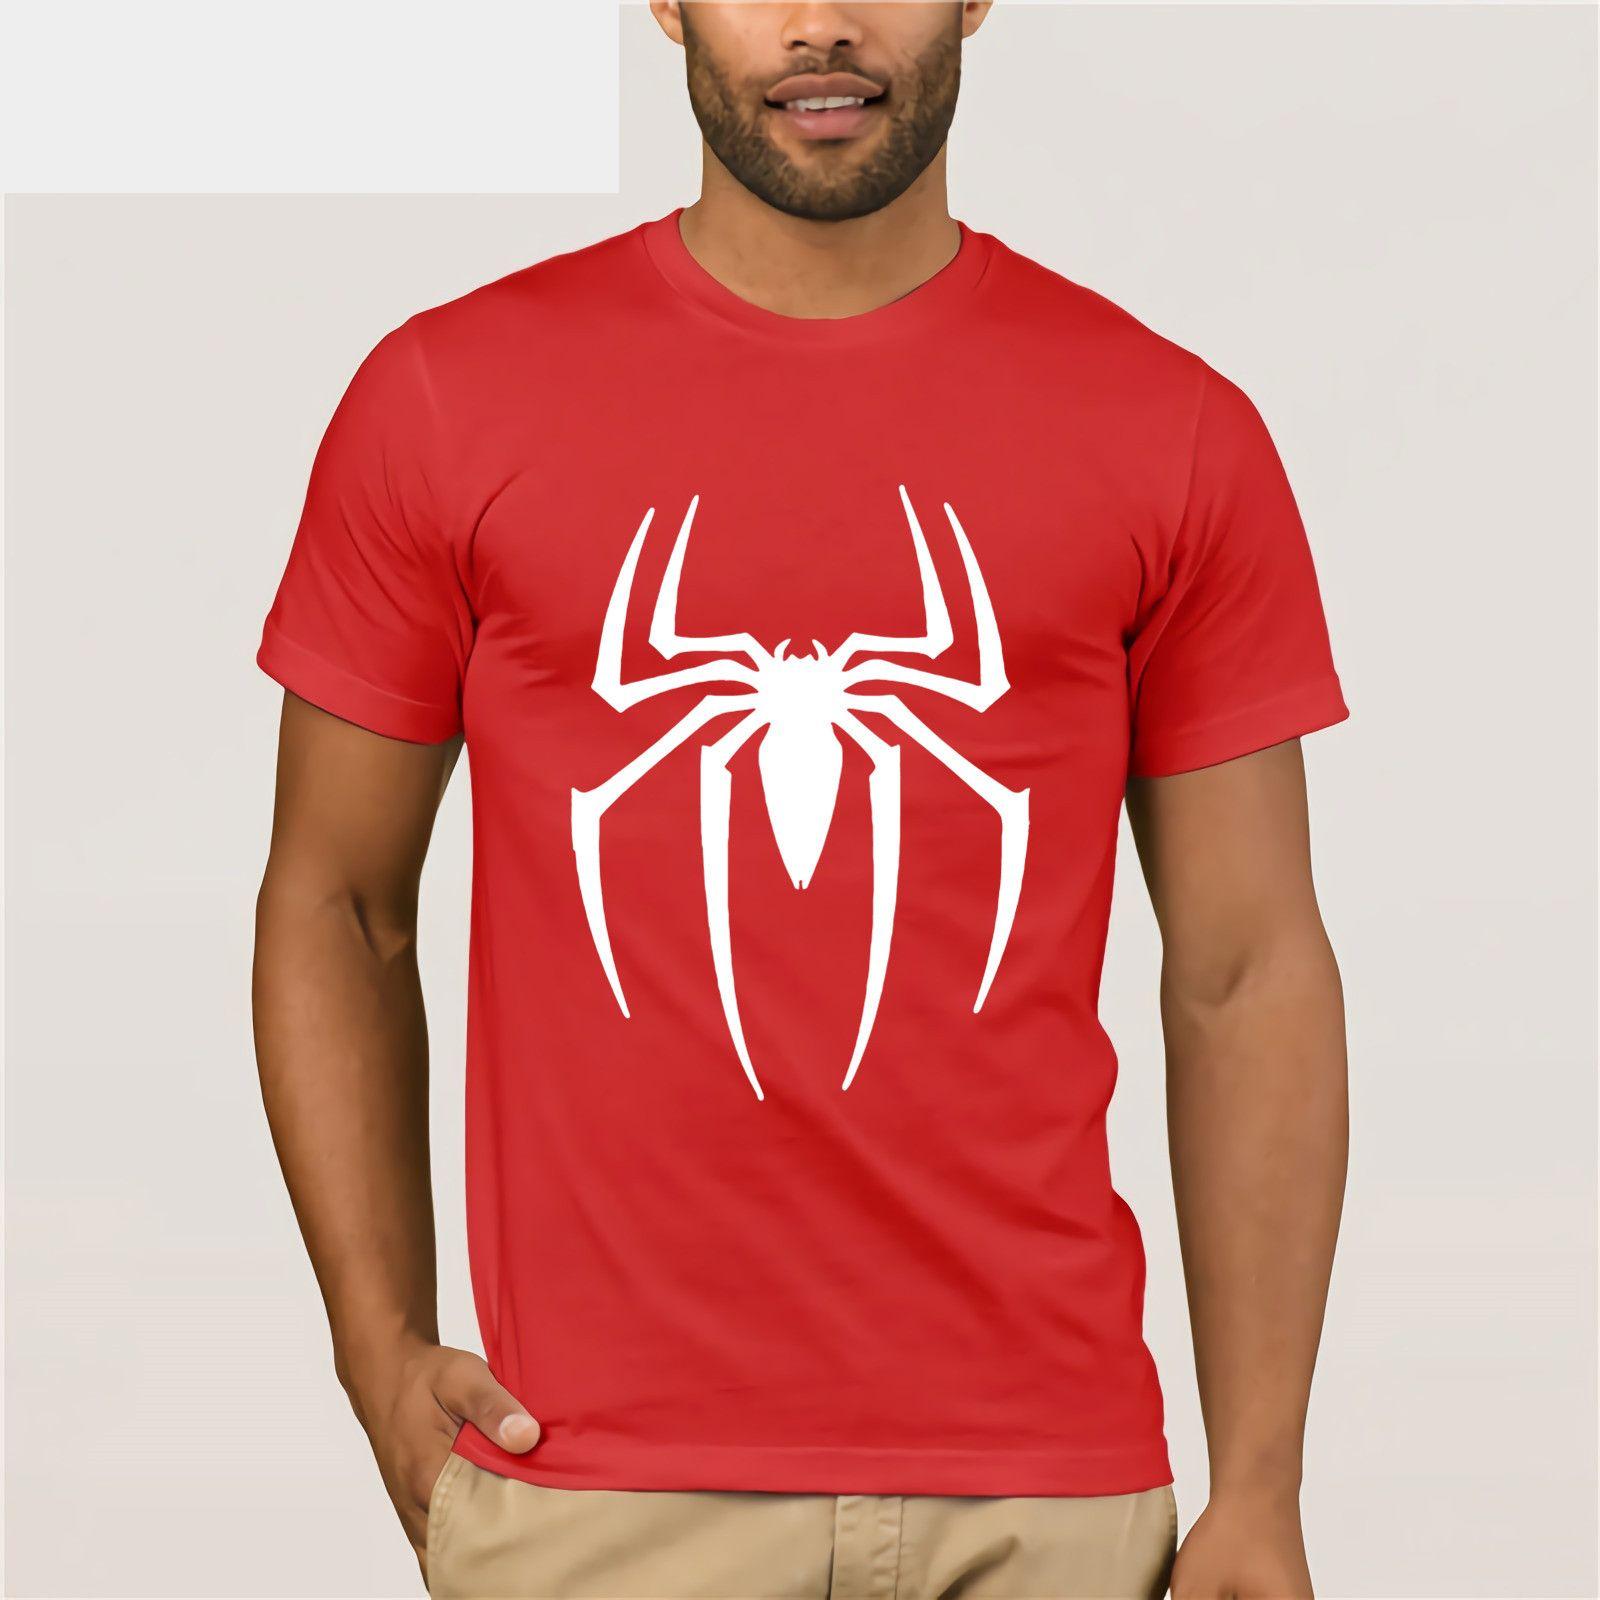 1c52ba2ca Spider Man Logo Print T Shirt Men Black Superhero Fashion T Shirt Spiderman  Tee Top Teenage Boy Tshirt The Avengers Clothing Tee Shirt Of The Day Link  ...